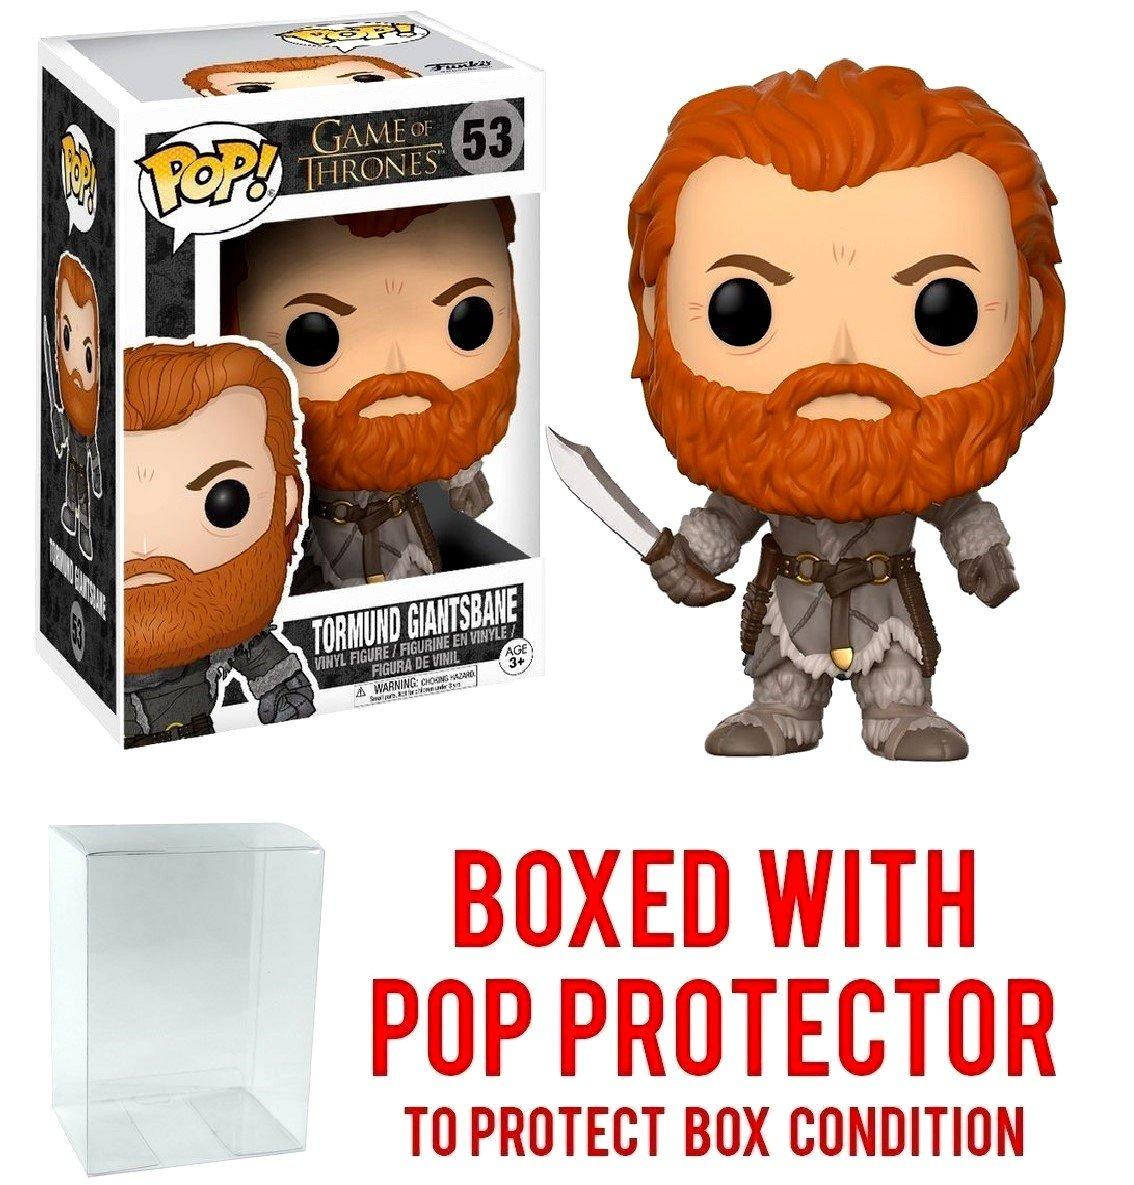 Funko Pop! Game of Thrones: GOT - Tormund Giantsbane #53 Vinyl Figure (Bundled with Pop BOX PROTECTOR CASE)